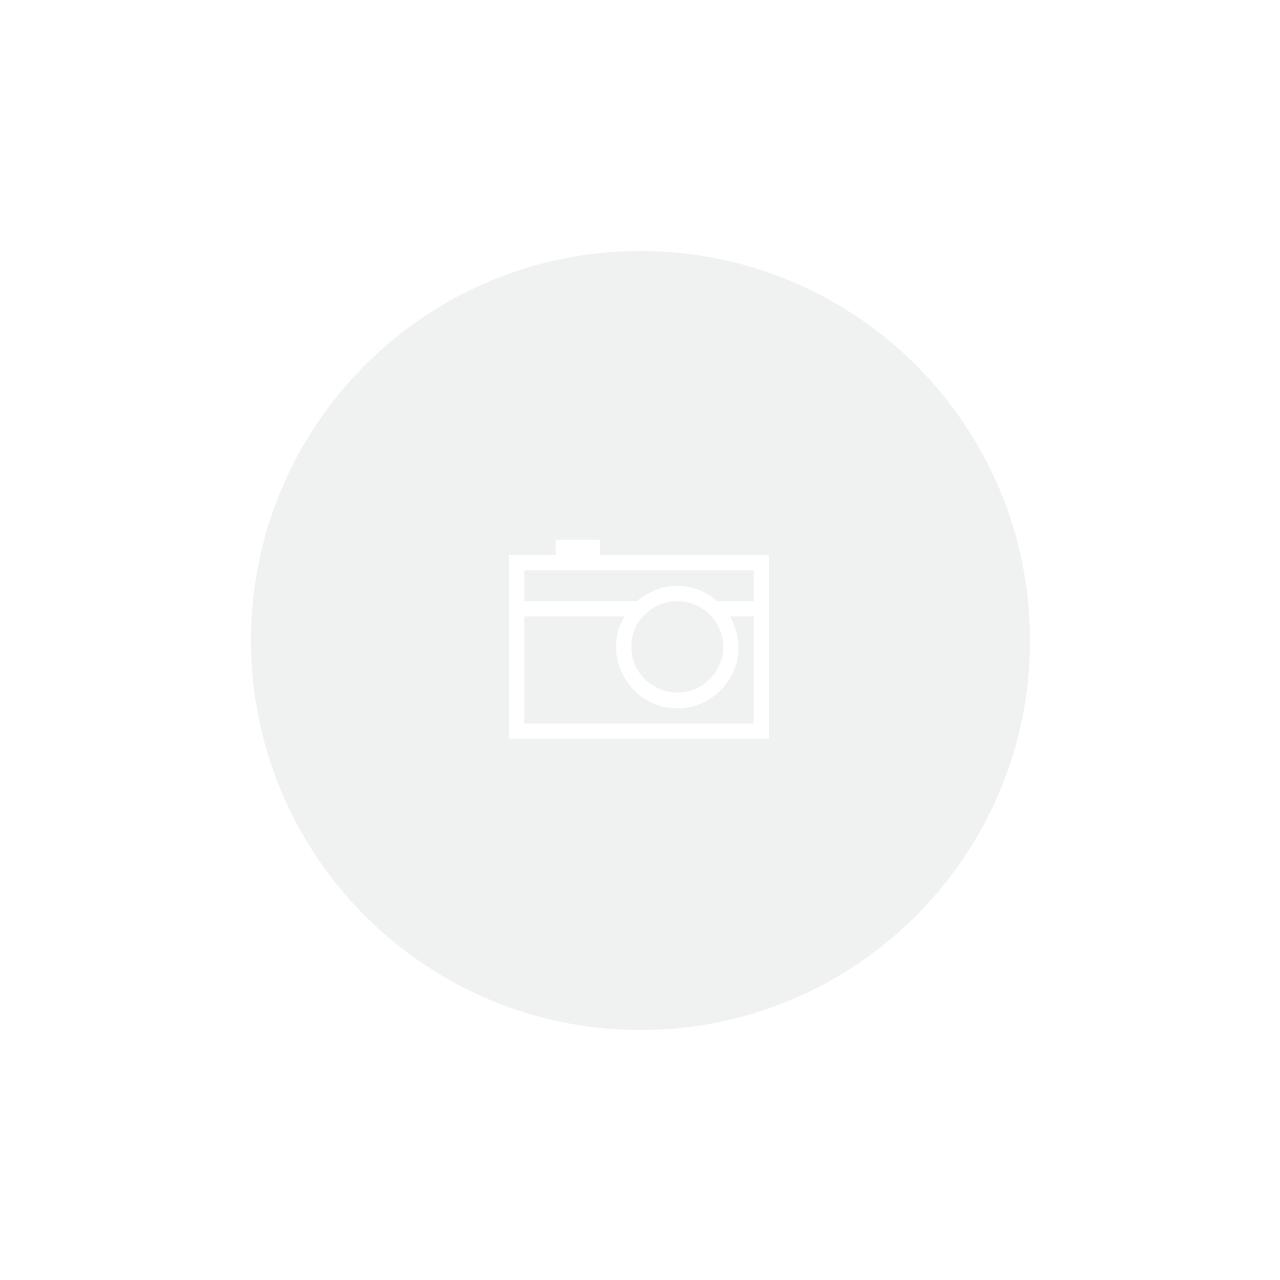 Bomboniere de Cristal c/ Tampa Dragon 10,3x10,3x17,2cm